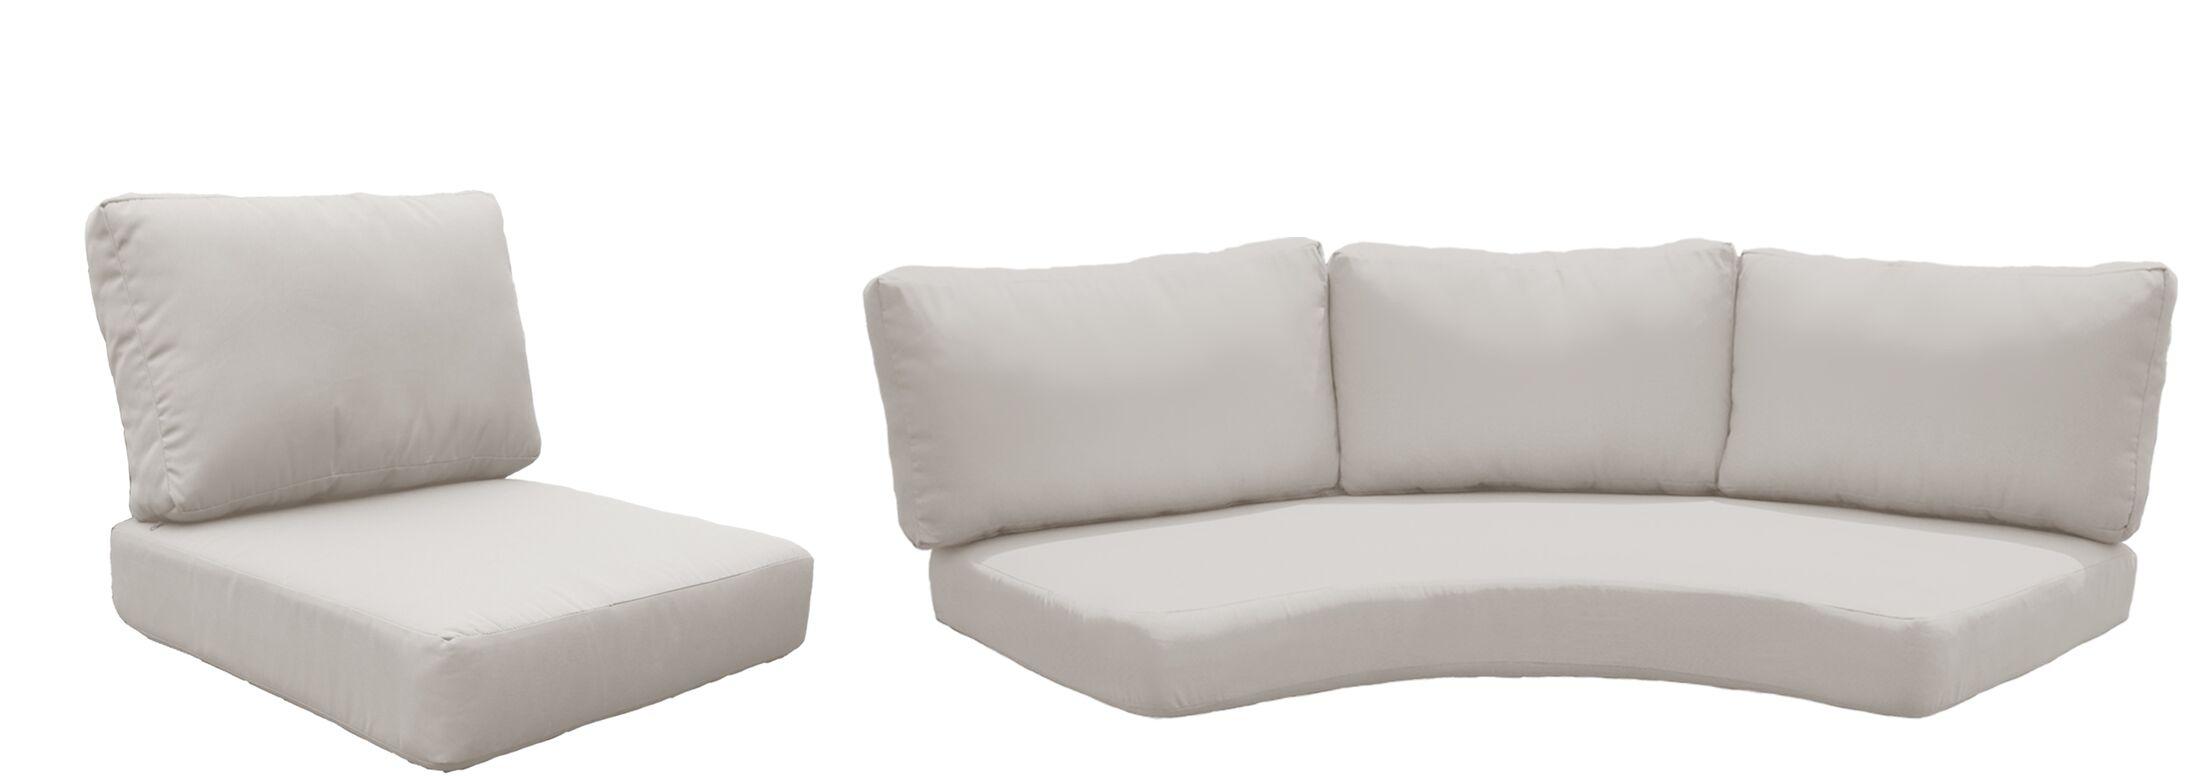 Fairmont 8 Piece Outdoor Cushion Set Fabric: Beige